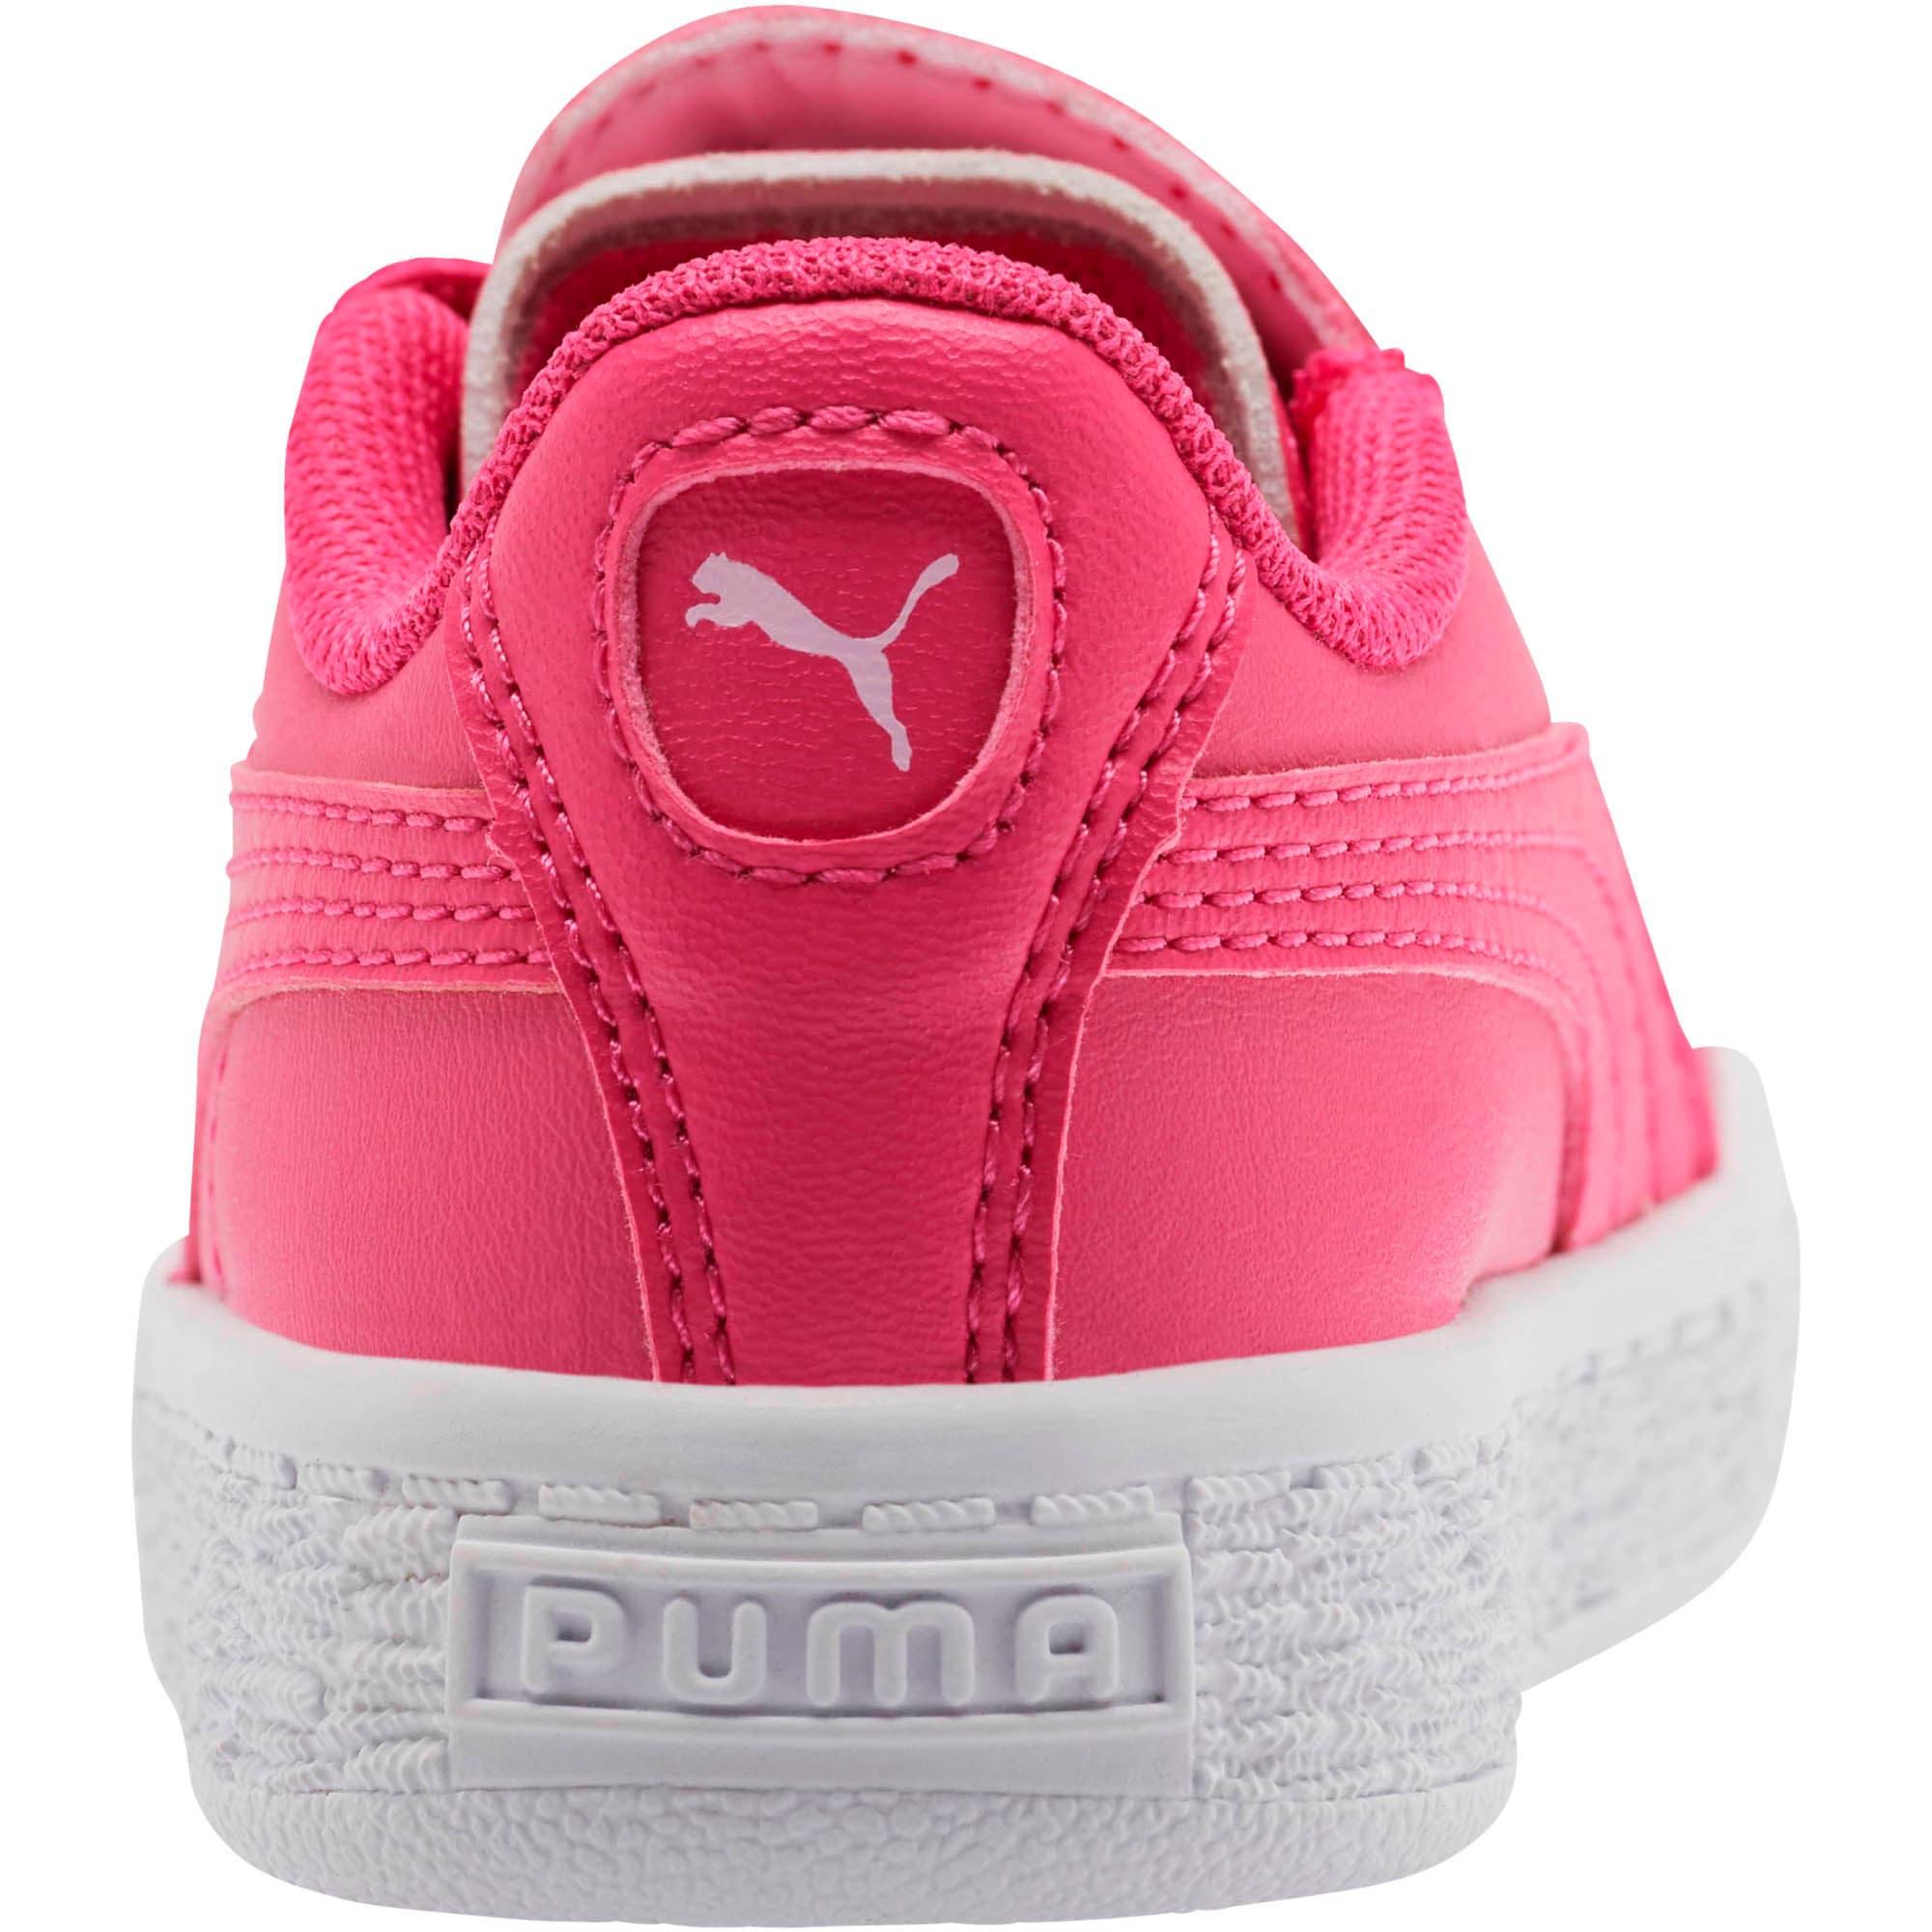 Thumbnail 4 of Basket Crush Glitter Hearts AC Toddler Shoes, Fuchsia Purple-Puma White, medium